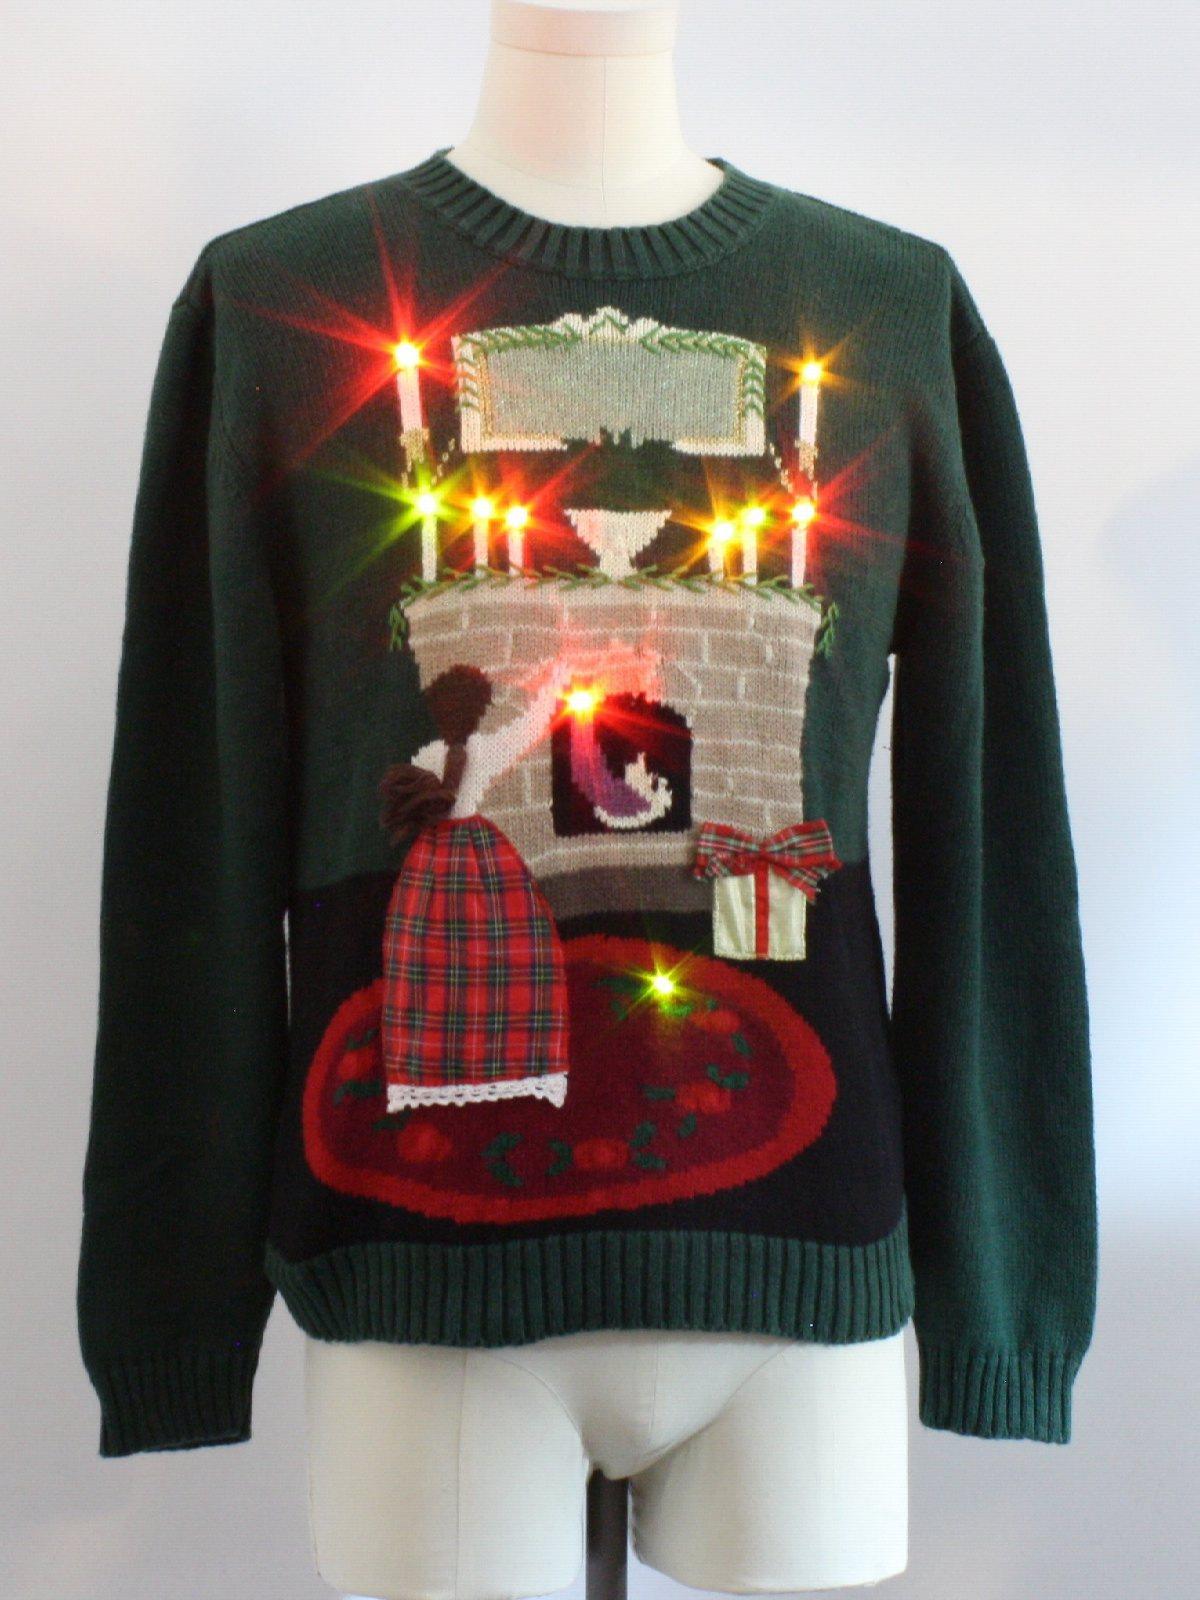 Lightup Ugly Christmas Sweater Lauren Rogers Unisex Dark Green Background Cotton Ramie Blend